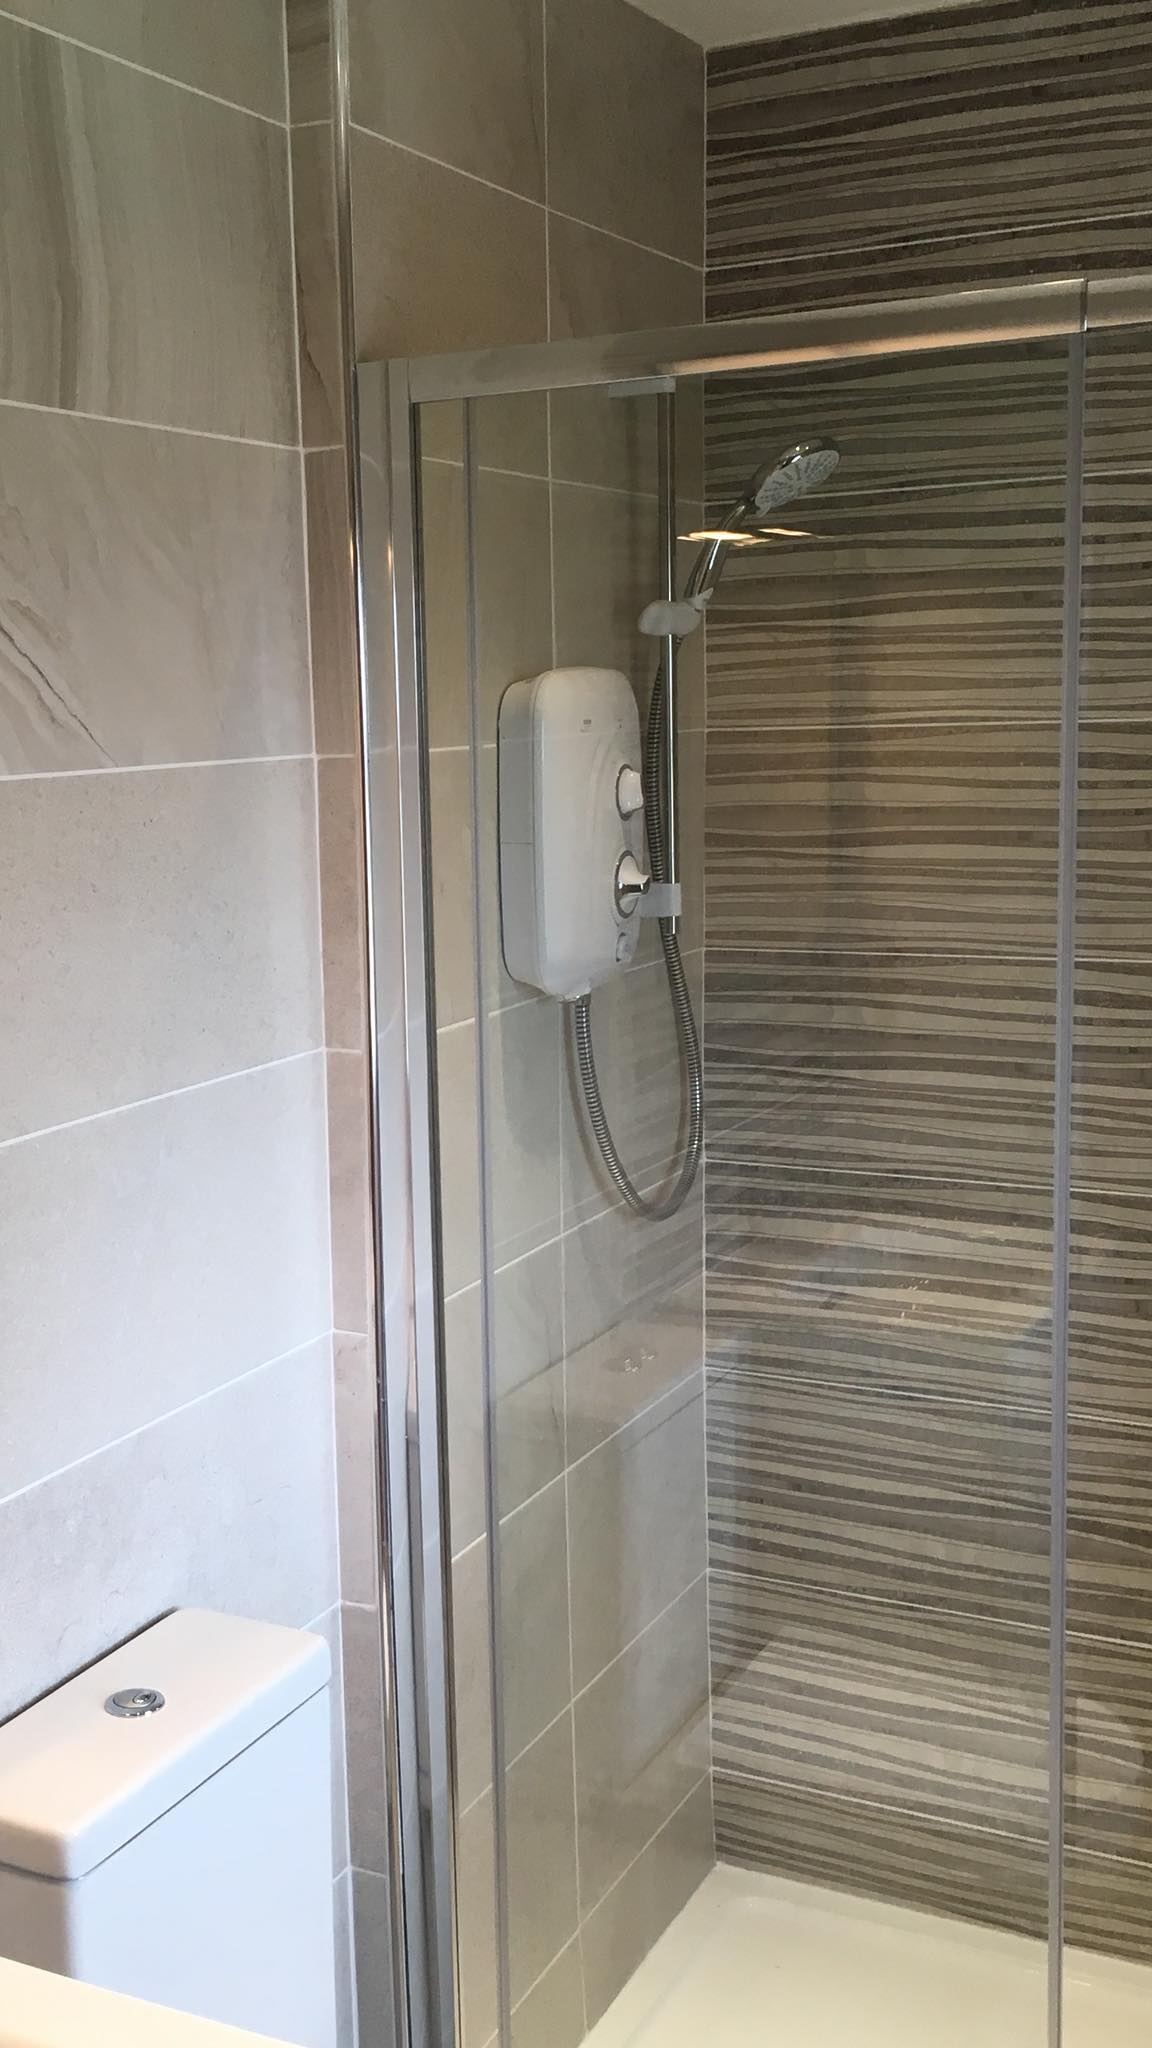 Bathroom renovation - shower & tiled wall